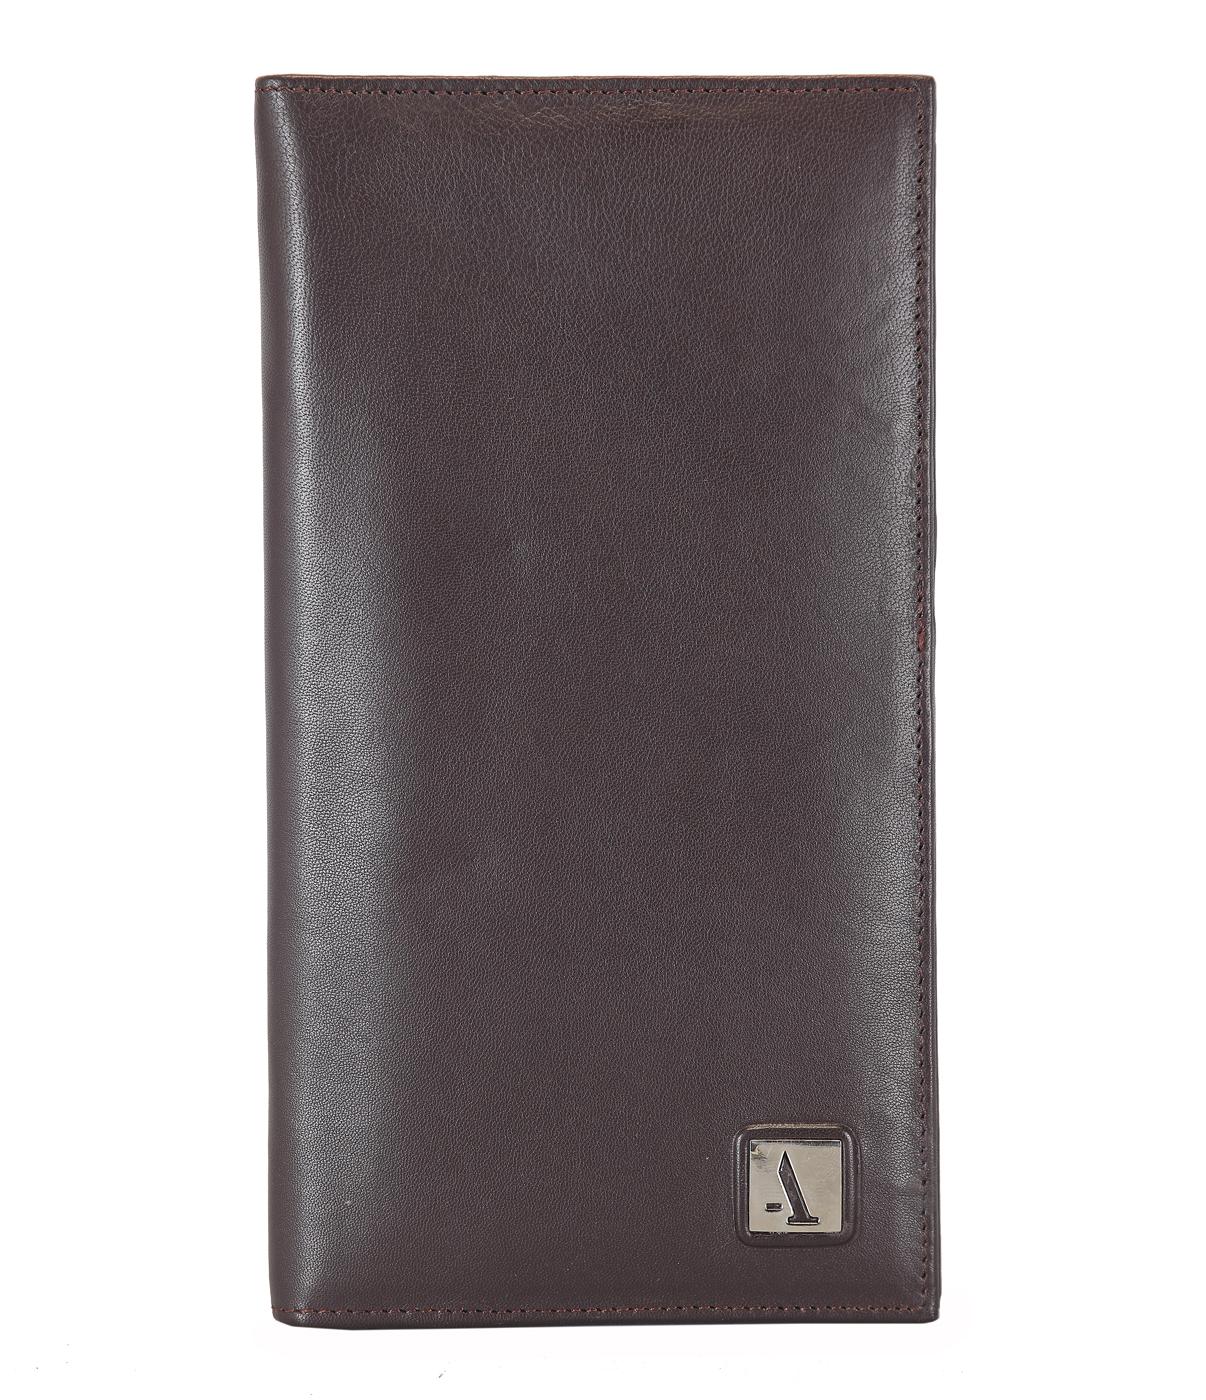 W10-Novio-Travel document wallet in soft Genuine Leather - Brown